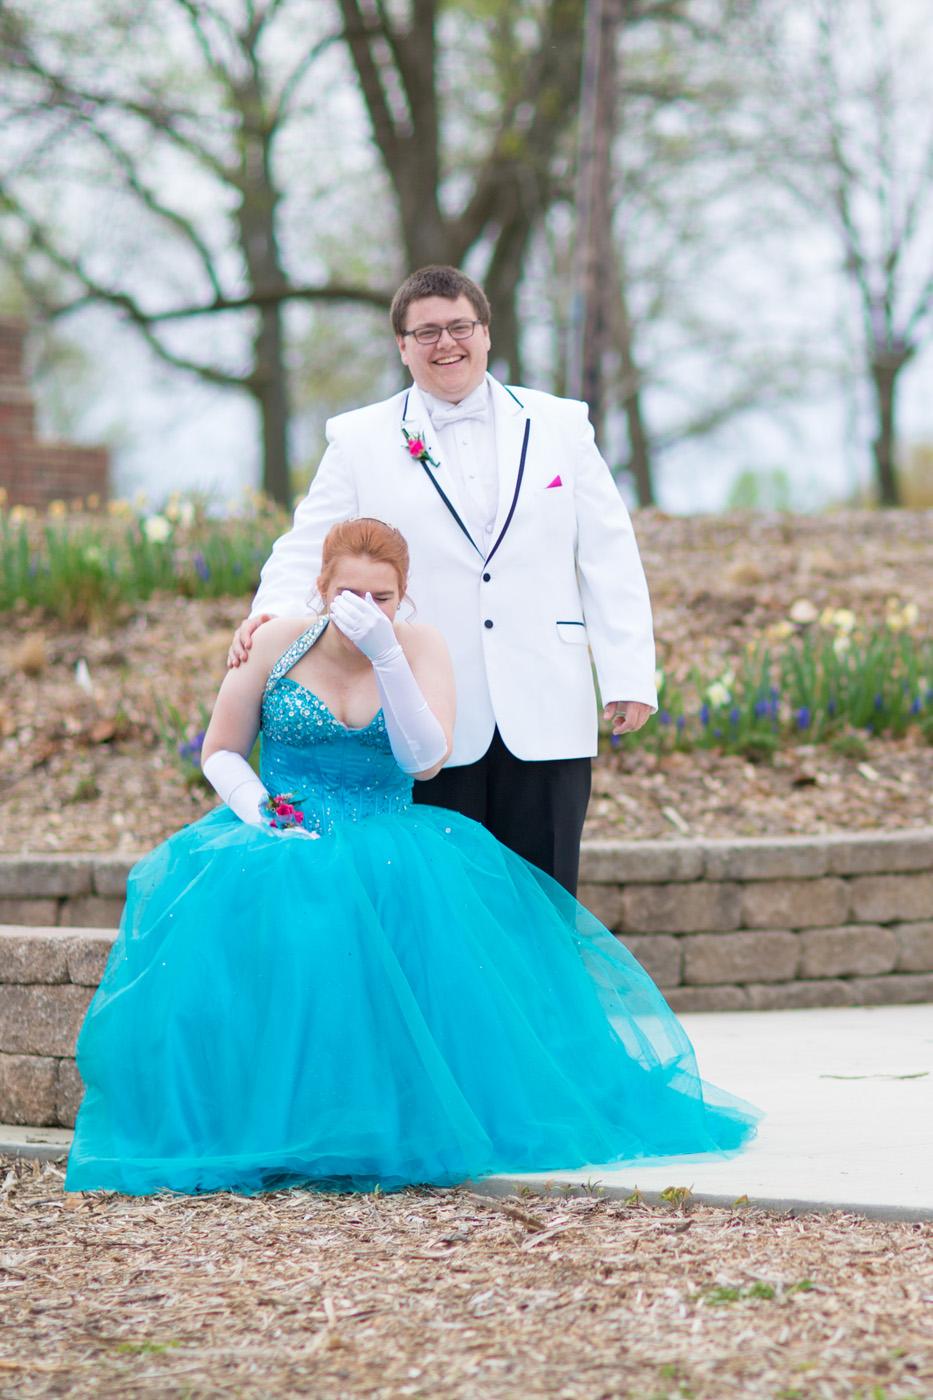 Garrett & Helen Prom 2014 166.jpg